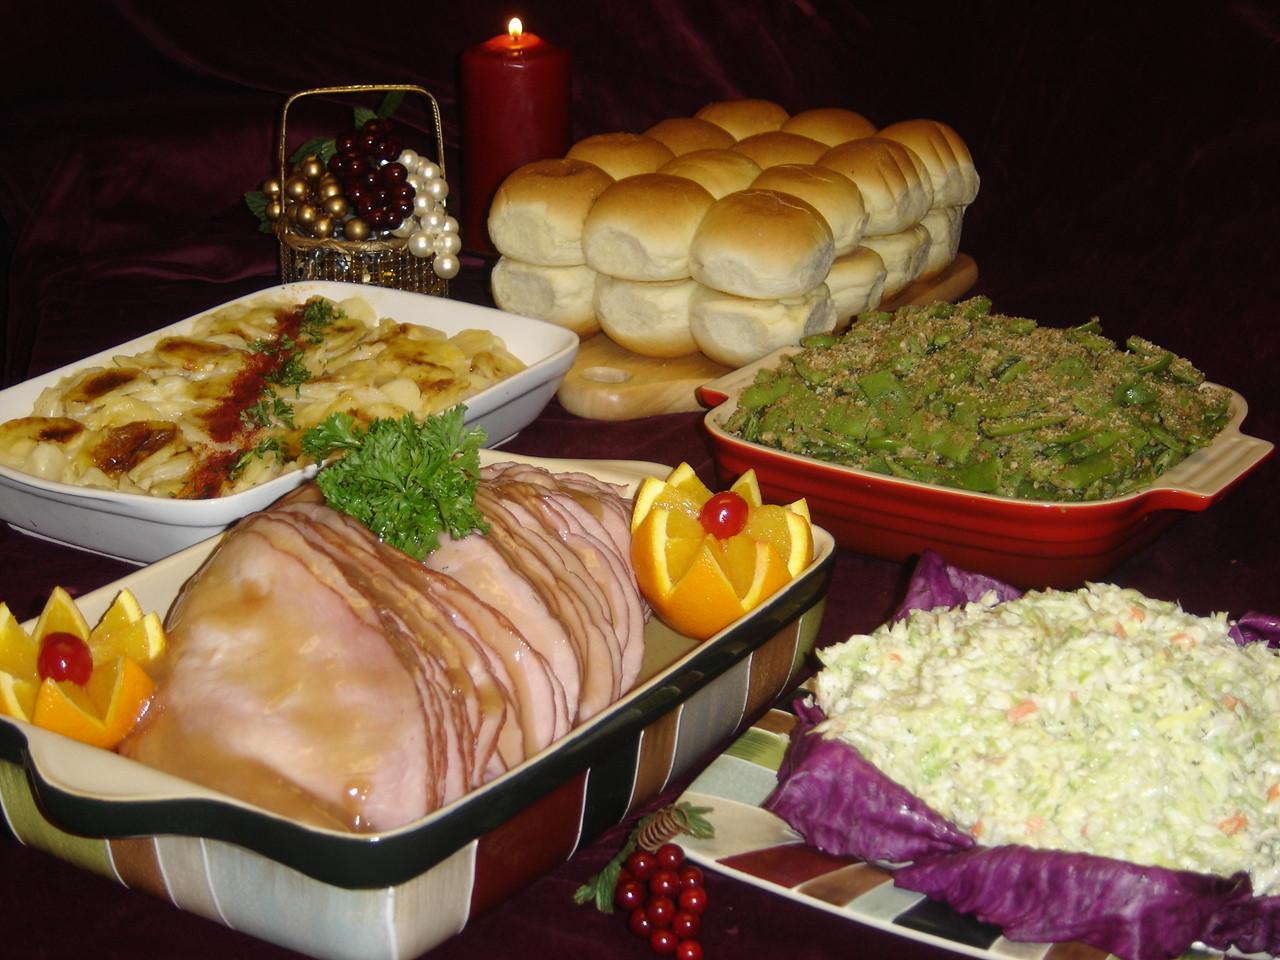 Easter Dinner Menu Traditional  Hop into Schiff's for Easter Dinner made easy